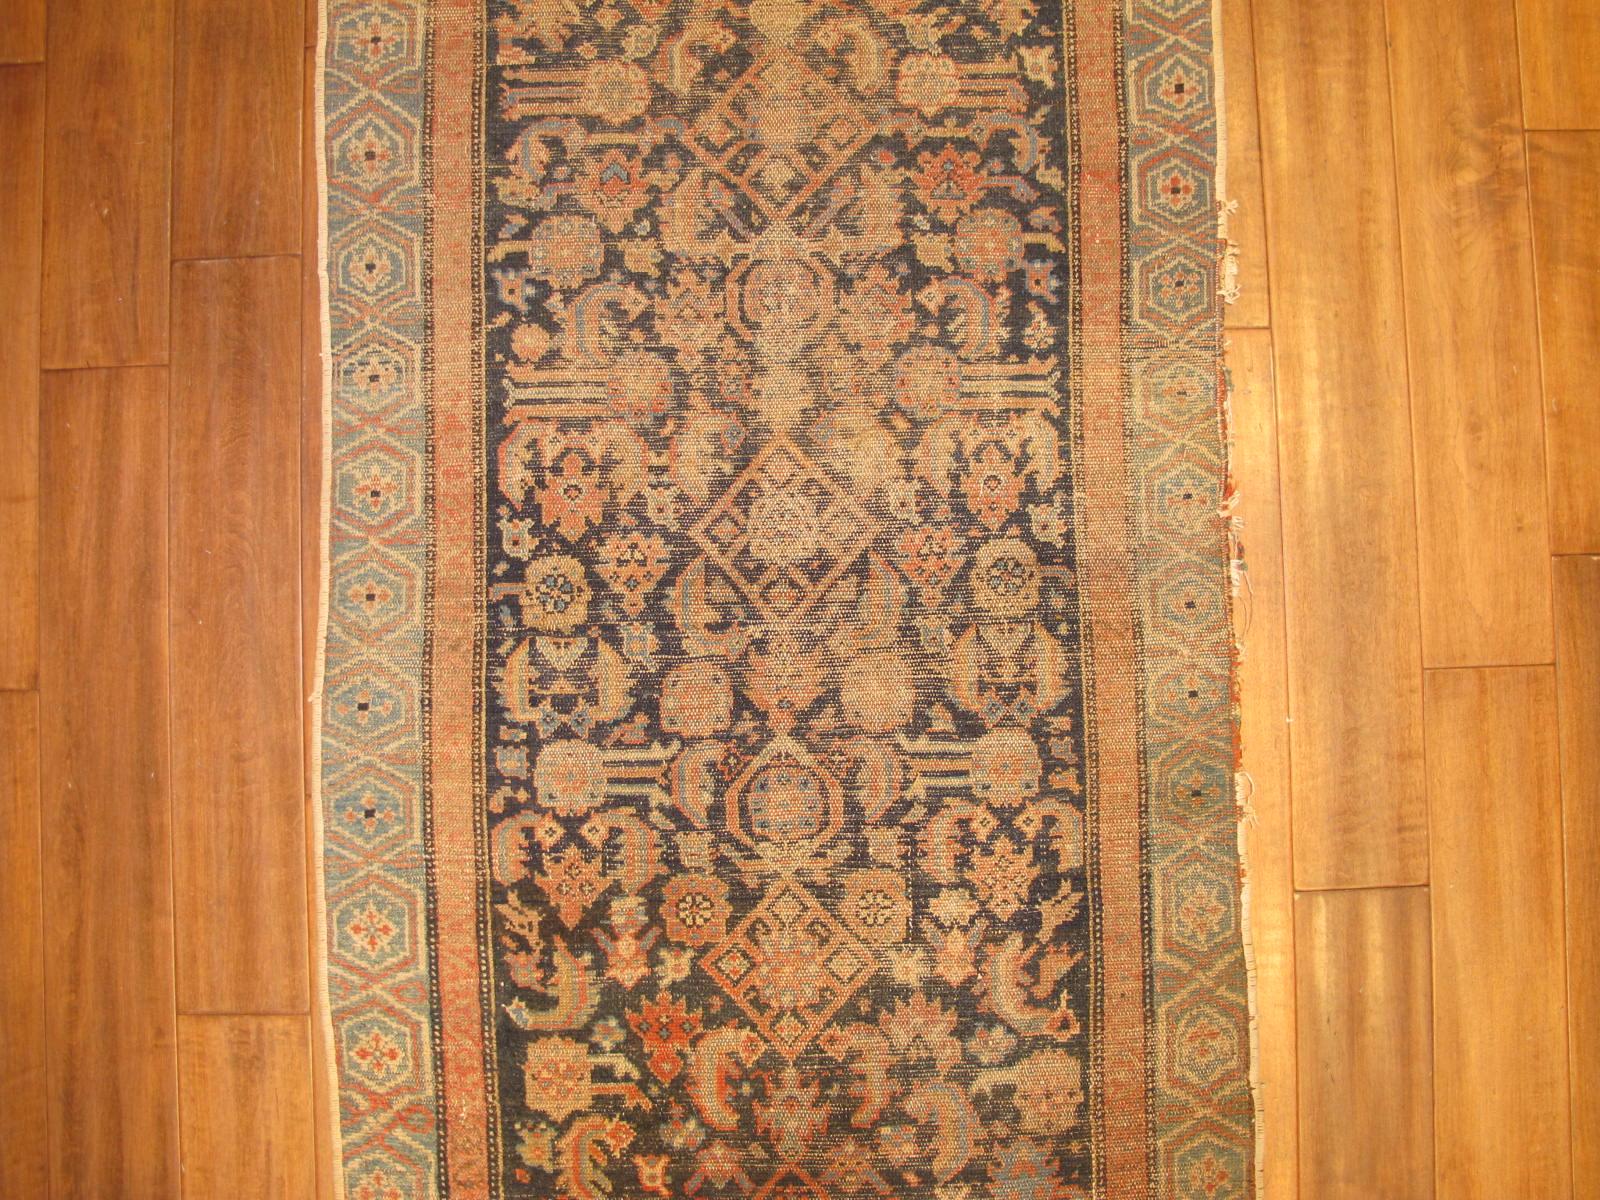 13099 antique persian malayer runner 2,9 x 10,4 (3)